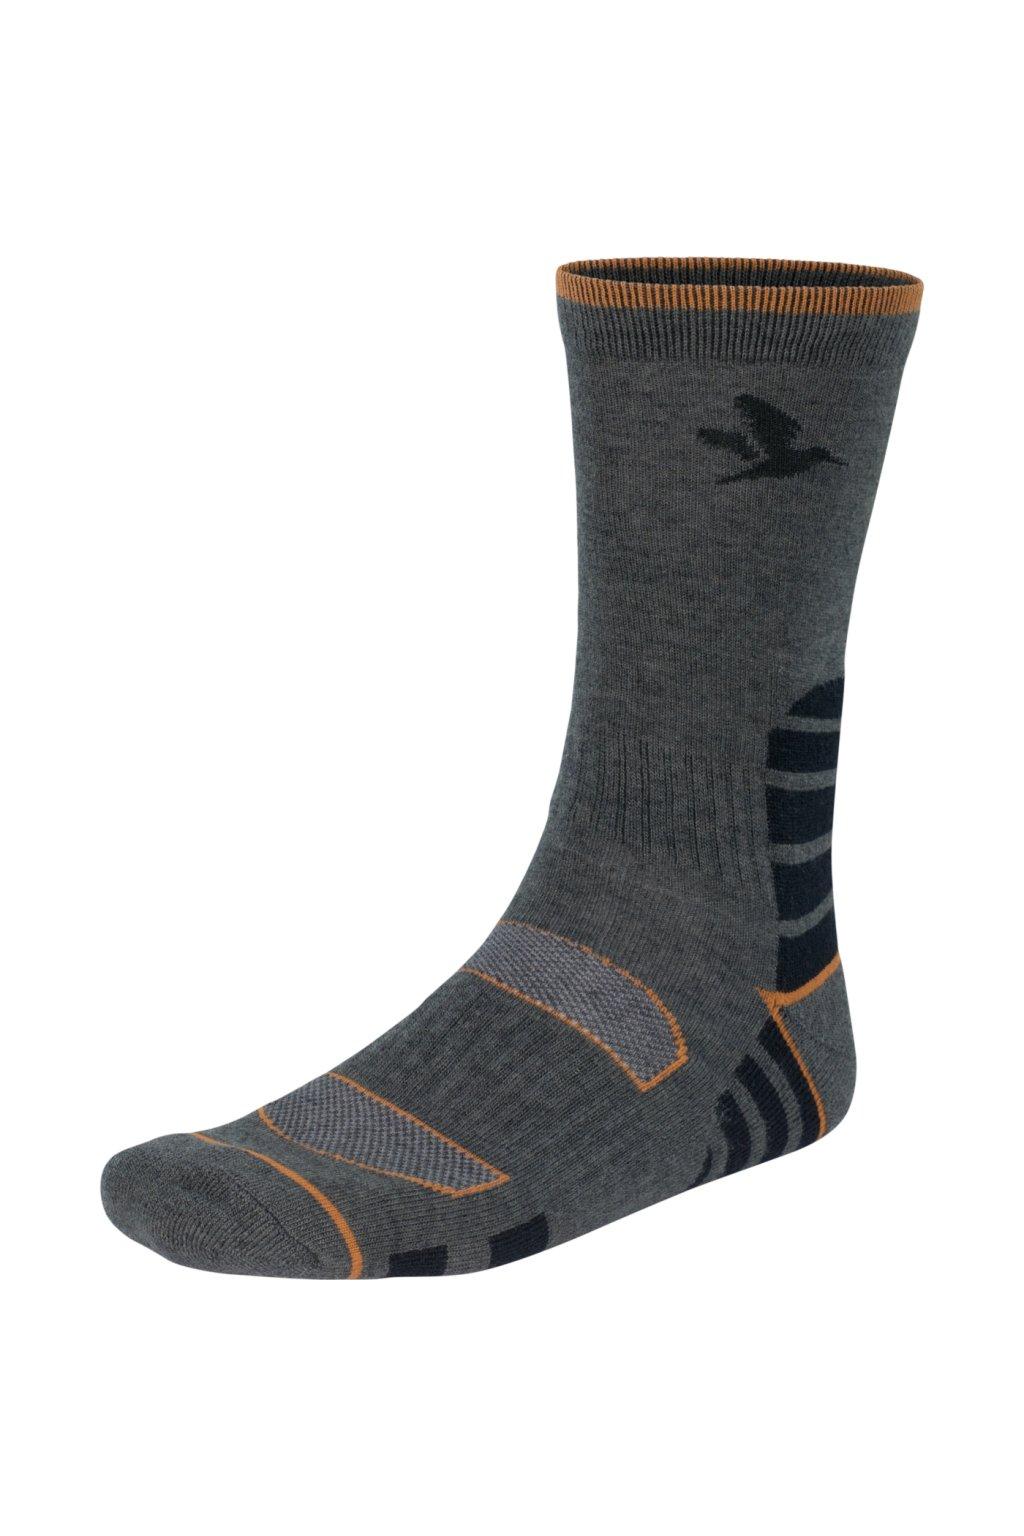 Seeland - ponožky Hawker stalking